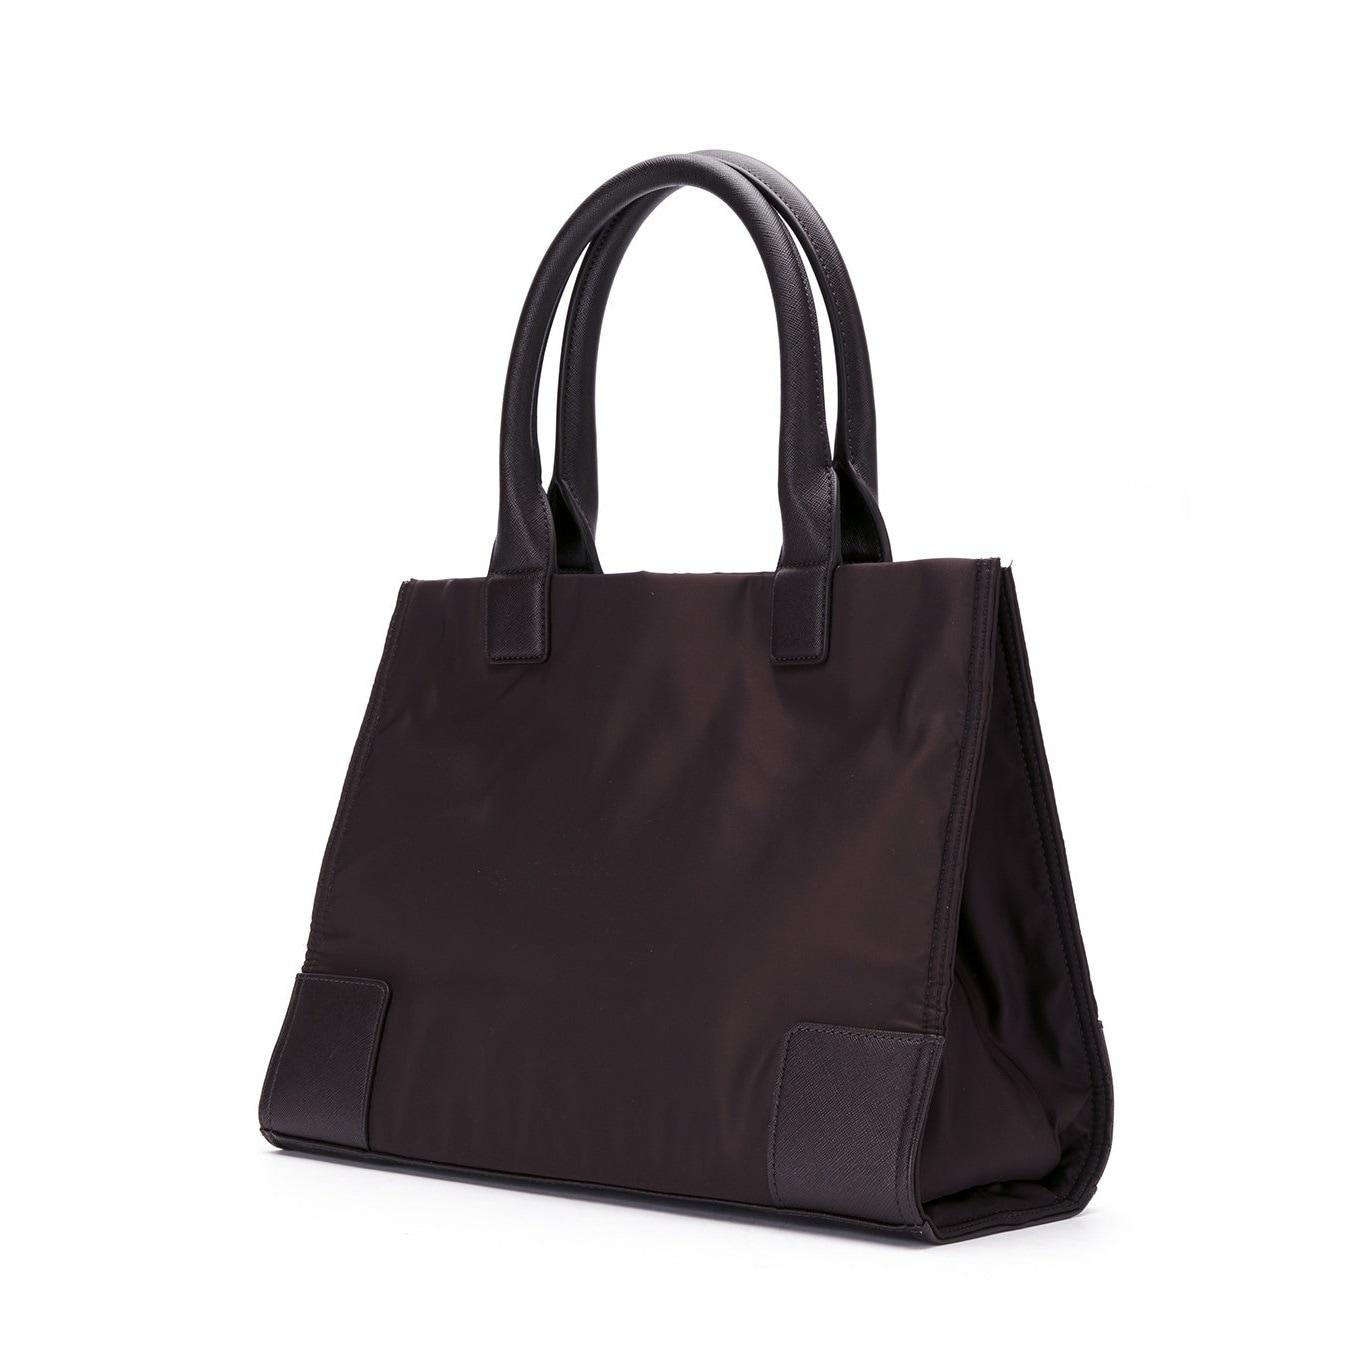 7f2b2494a0c Shop Tory Burch Stud Mini Ella Stud Logo Tote Bag - Free Shipping ...